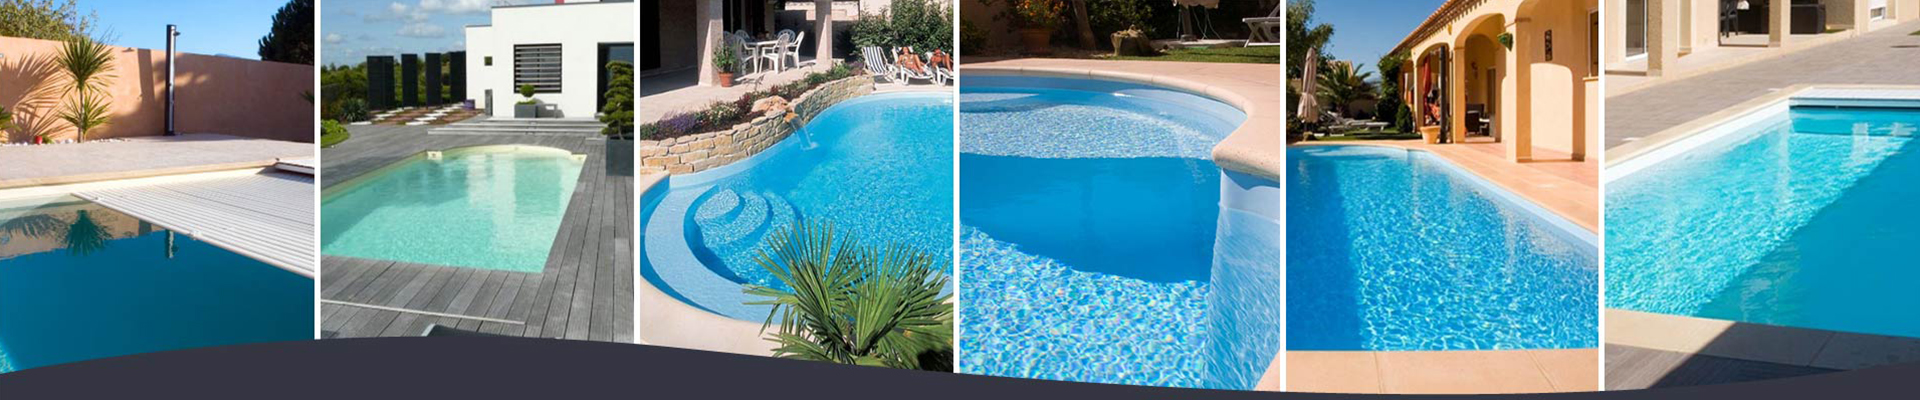 Bande photo de piscines